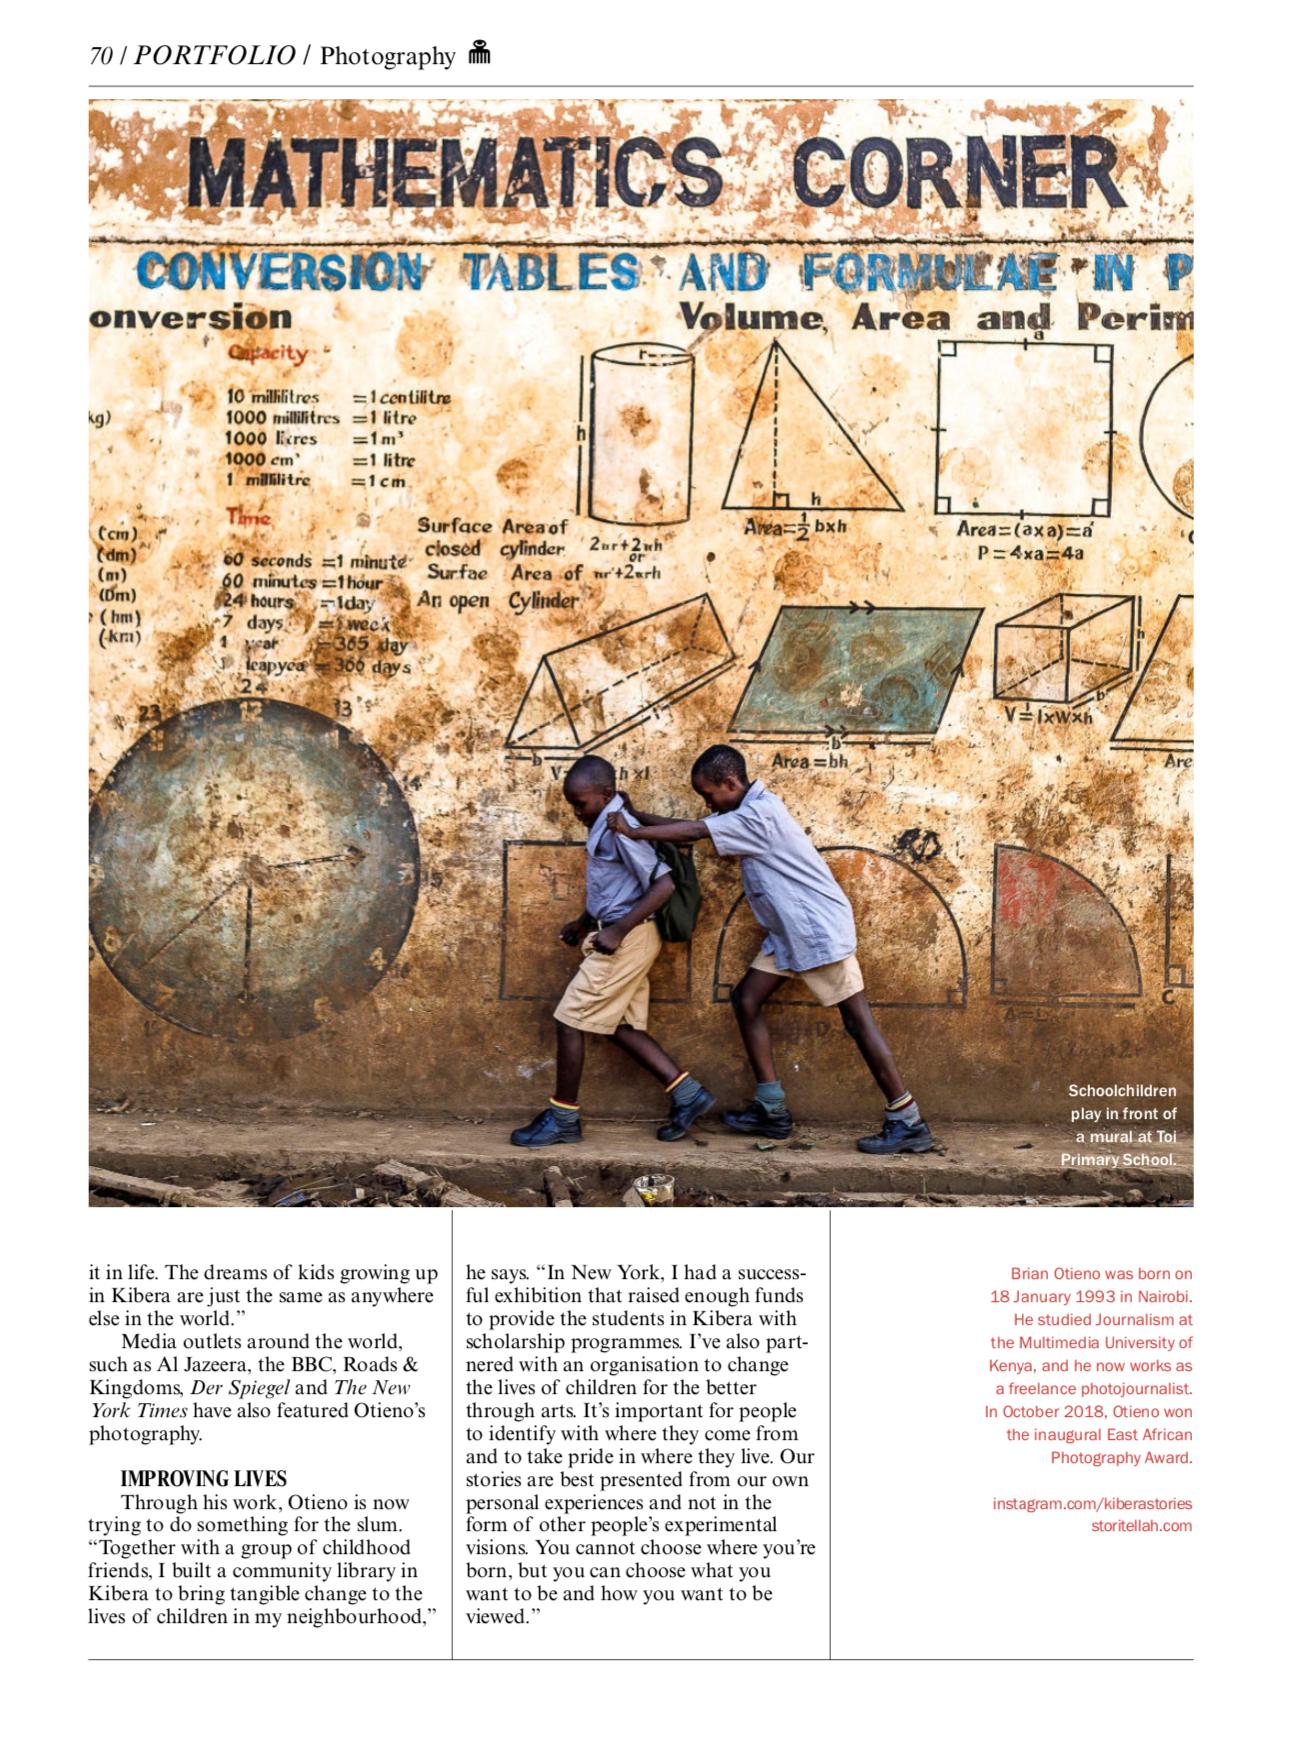 Msafiri - Brian Otieno - Storitellah - Kibera Stories - Interview by Joost Bastmeijer 6.png